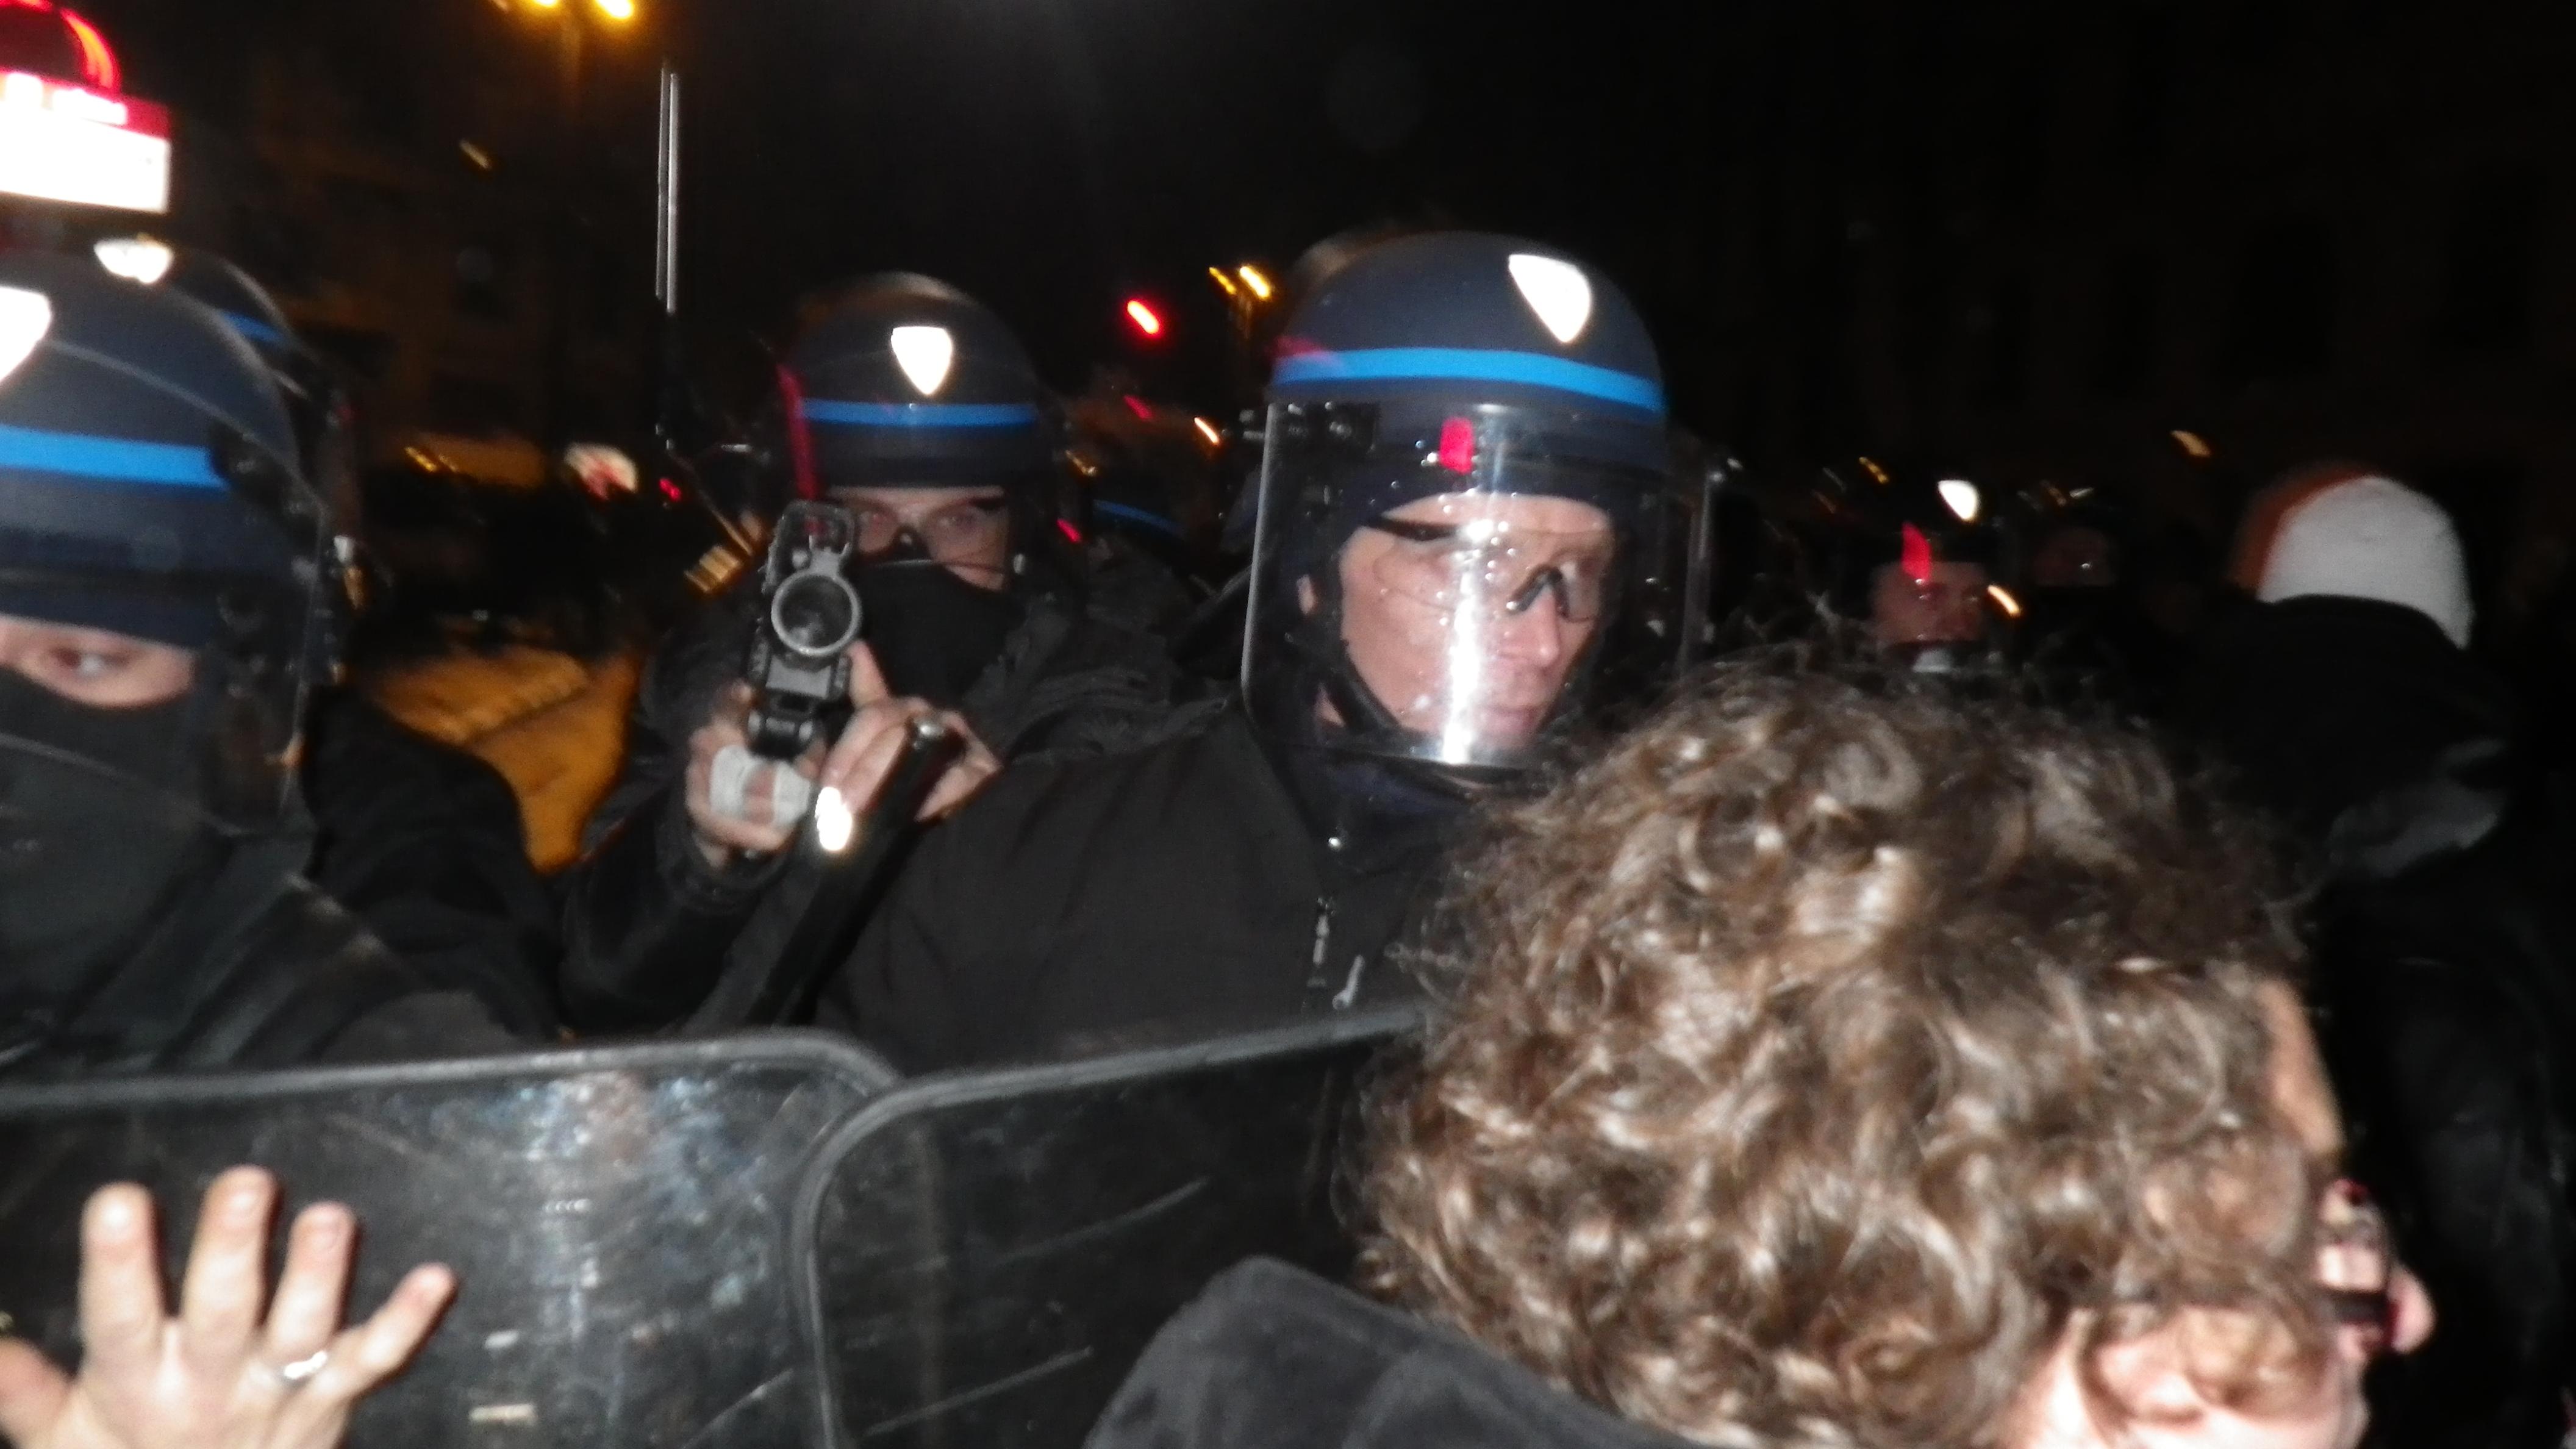 http://juralib.noblogs.org/files/2012/12/17.jpeg